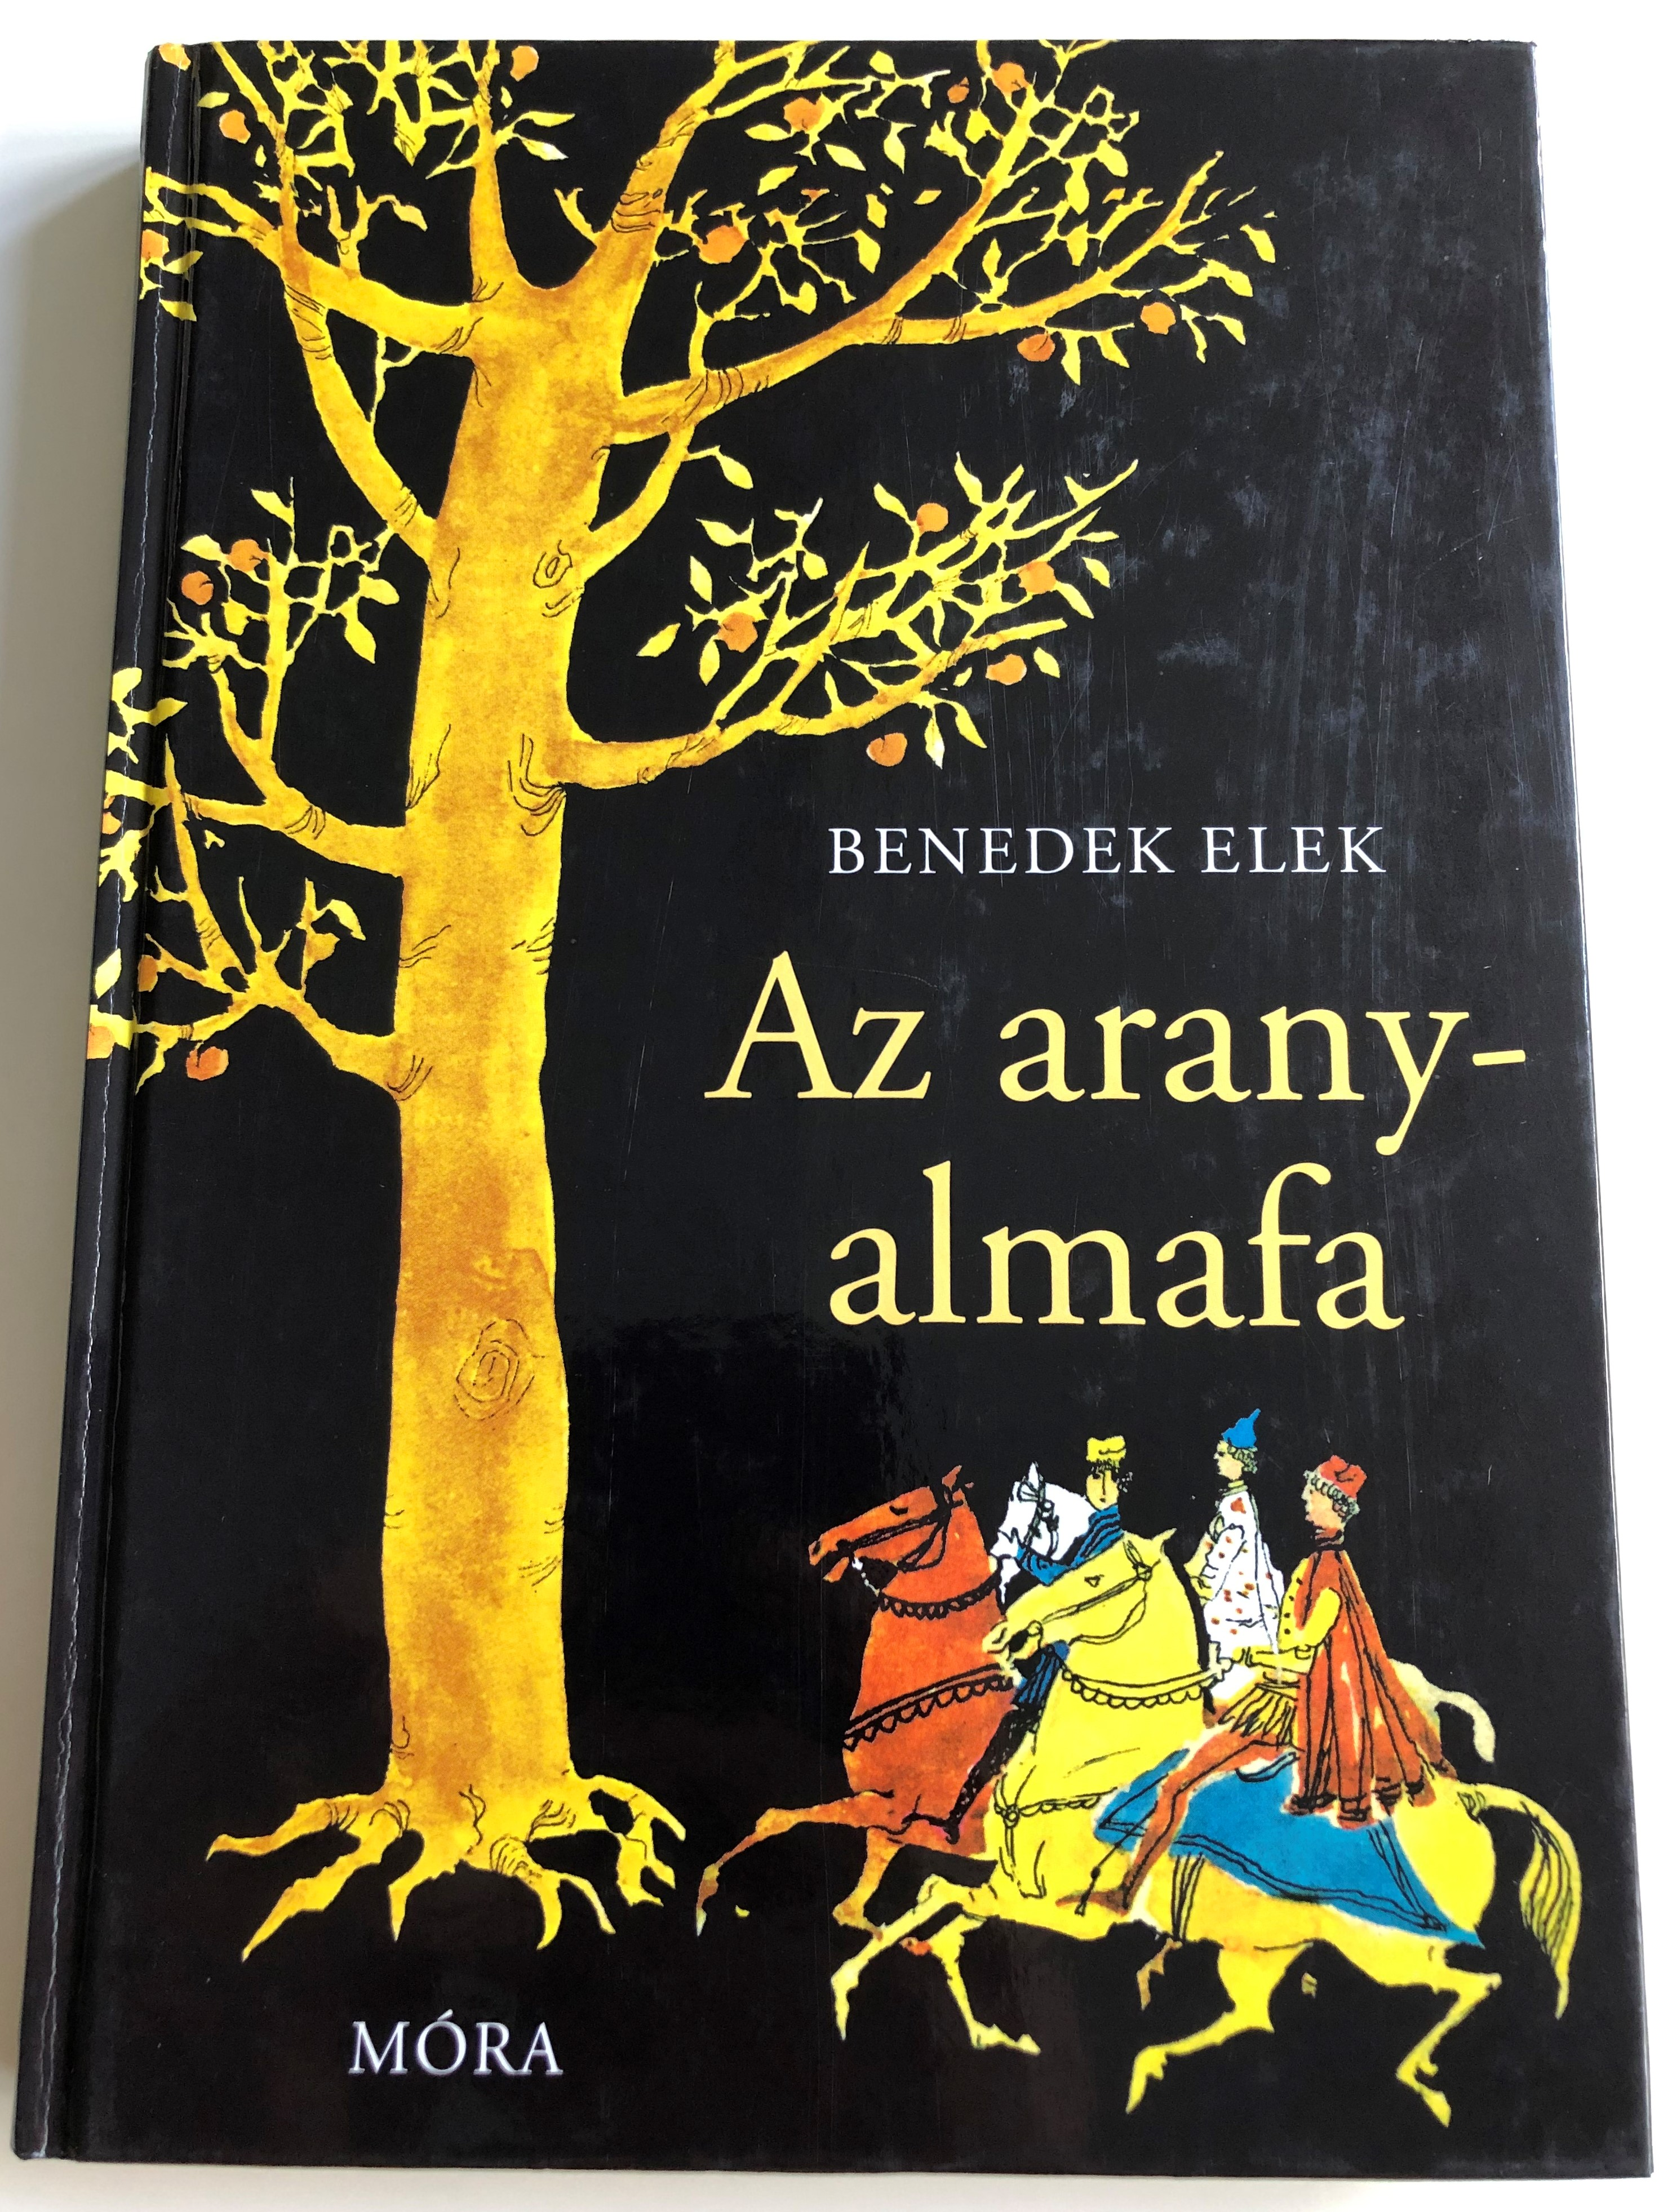 az-aranyalmafa-by-benedek-elek-foreign-stories-in-hungarian-language-7th-edition-illustrations-szecsk-tam-s-m-ra-k-nyvkiad-2013-1-.jpg